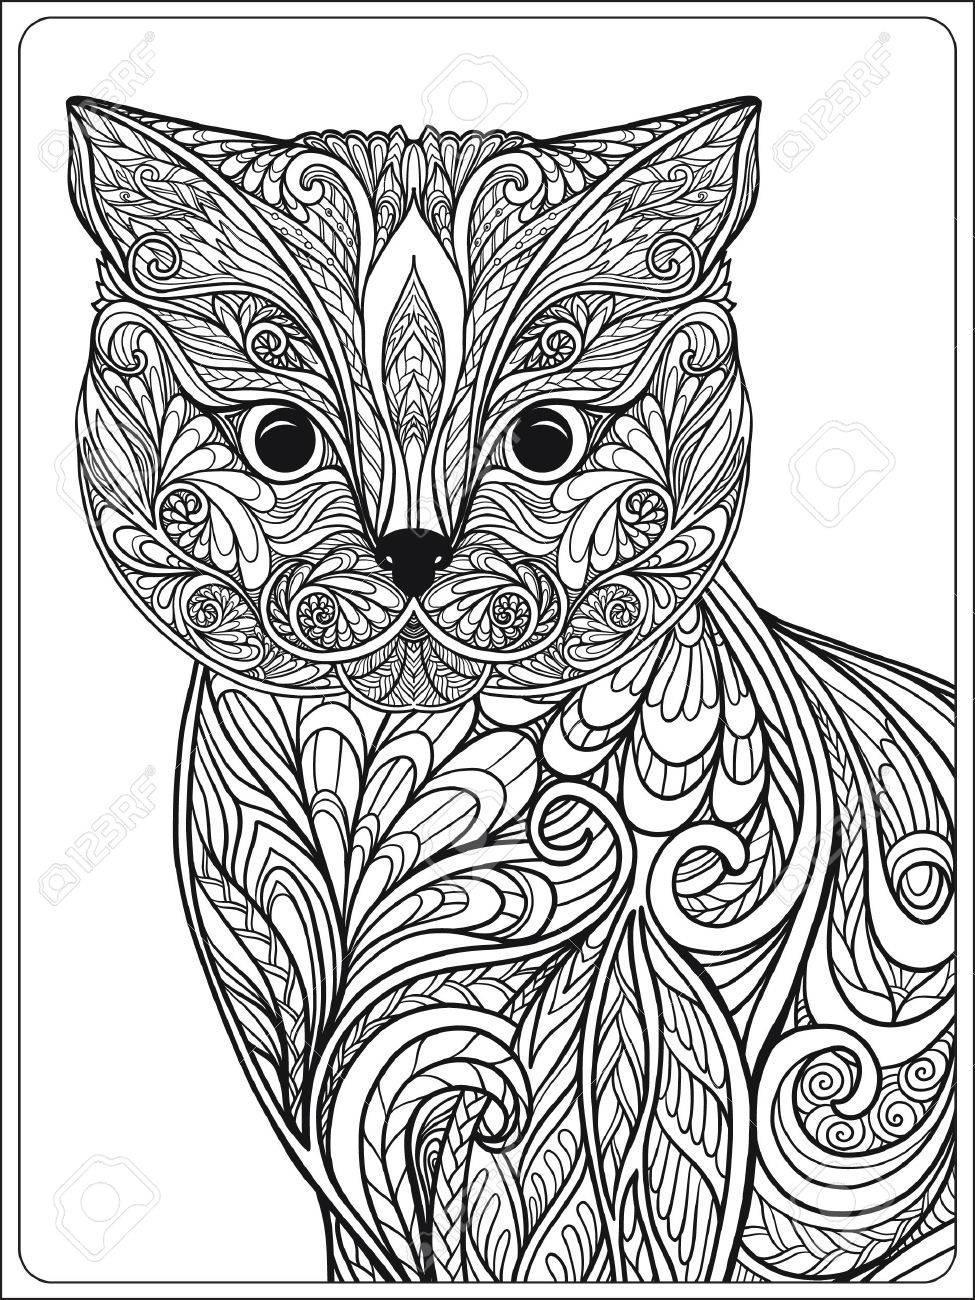 decorative cat vector illustration adult coloring book coloring page vector illustration - Cat Coloring Book